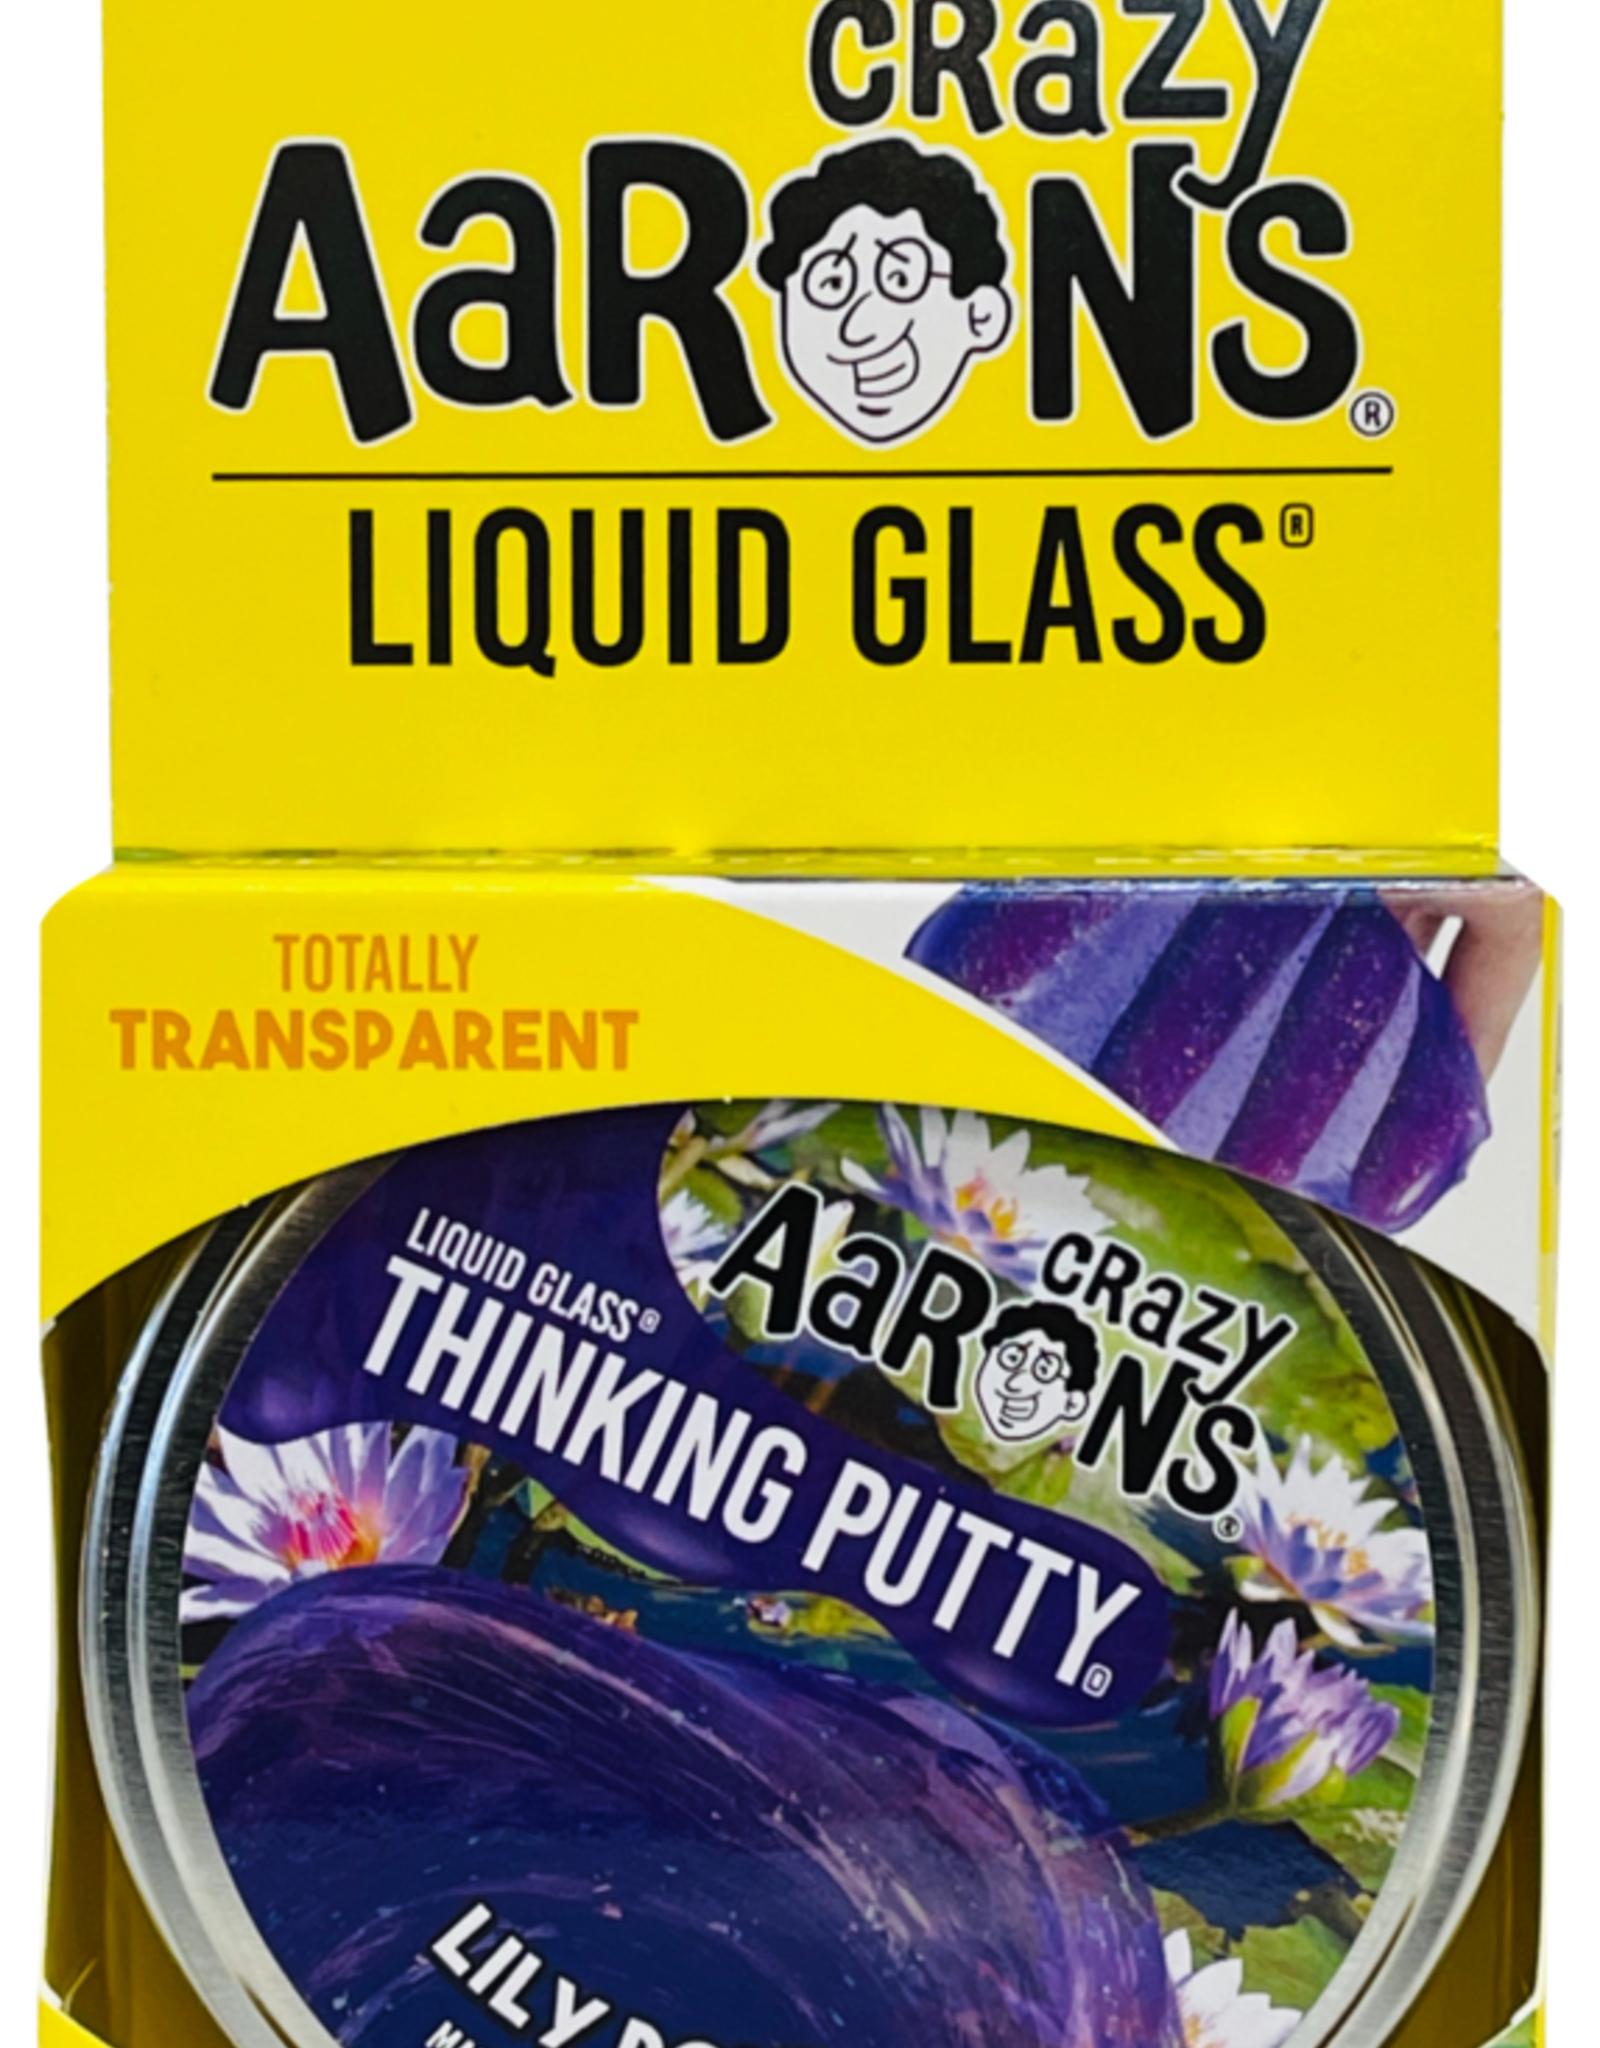 Crazy Aarons Putty Liquid Glass Lily Pond Purple